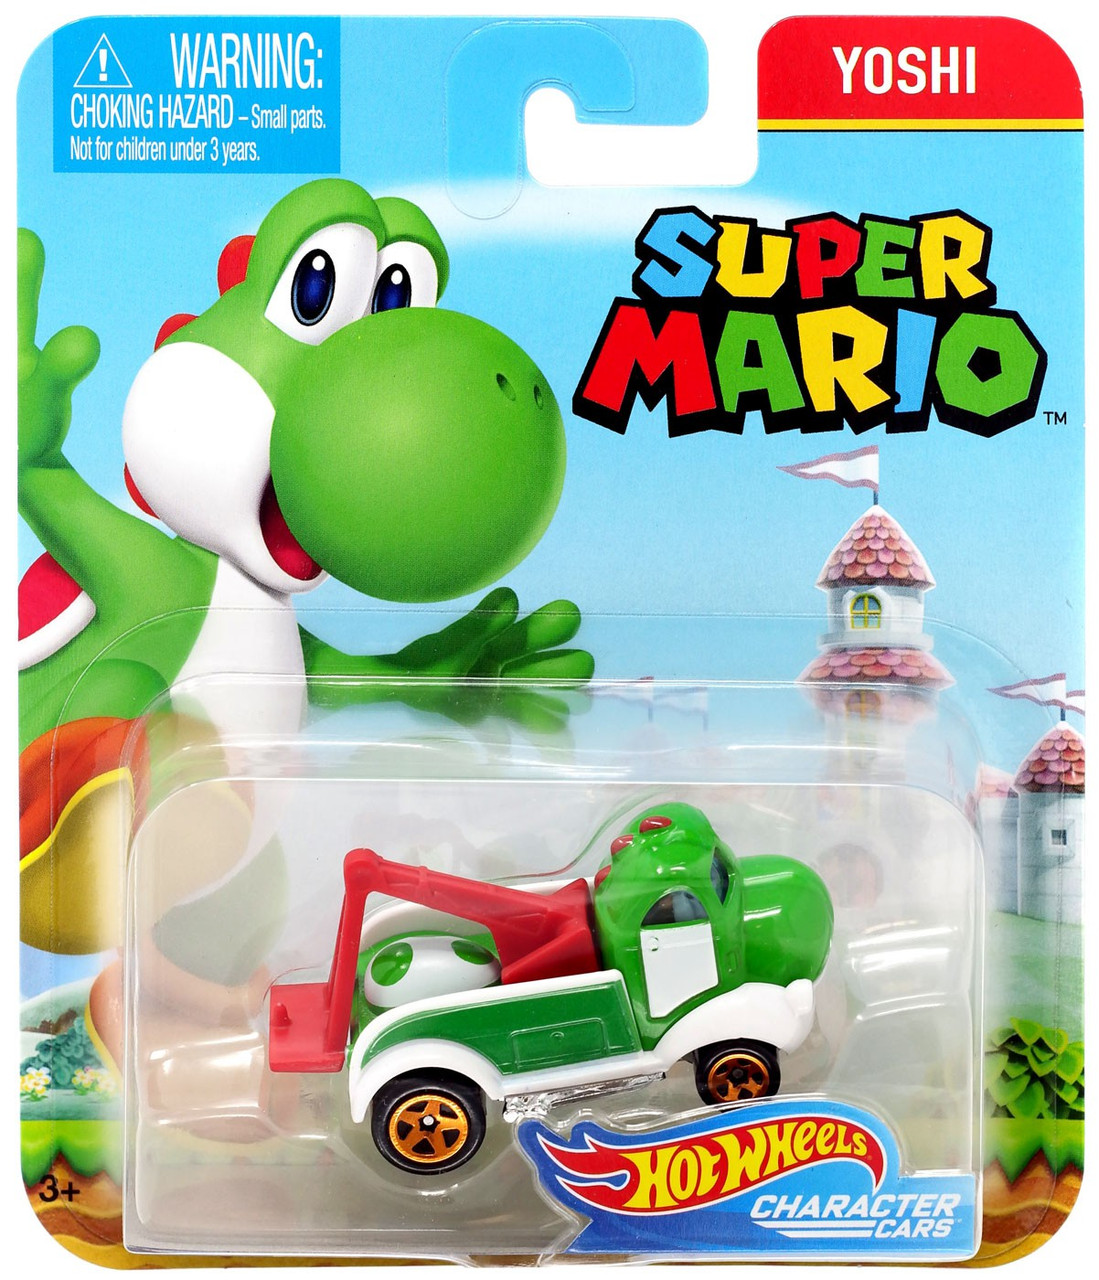 Hot Wheels Super Mario Character Cars Yoshi 164 Diecast Car Mattel